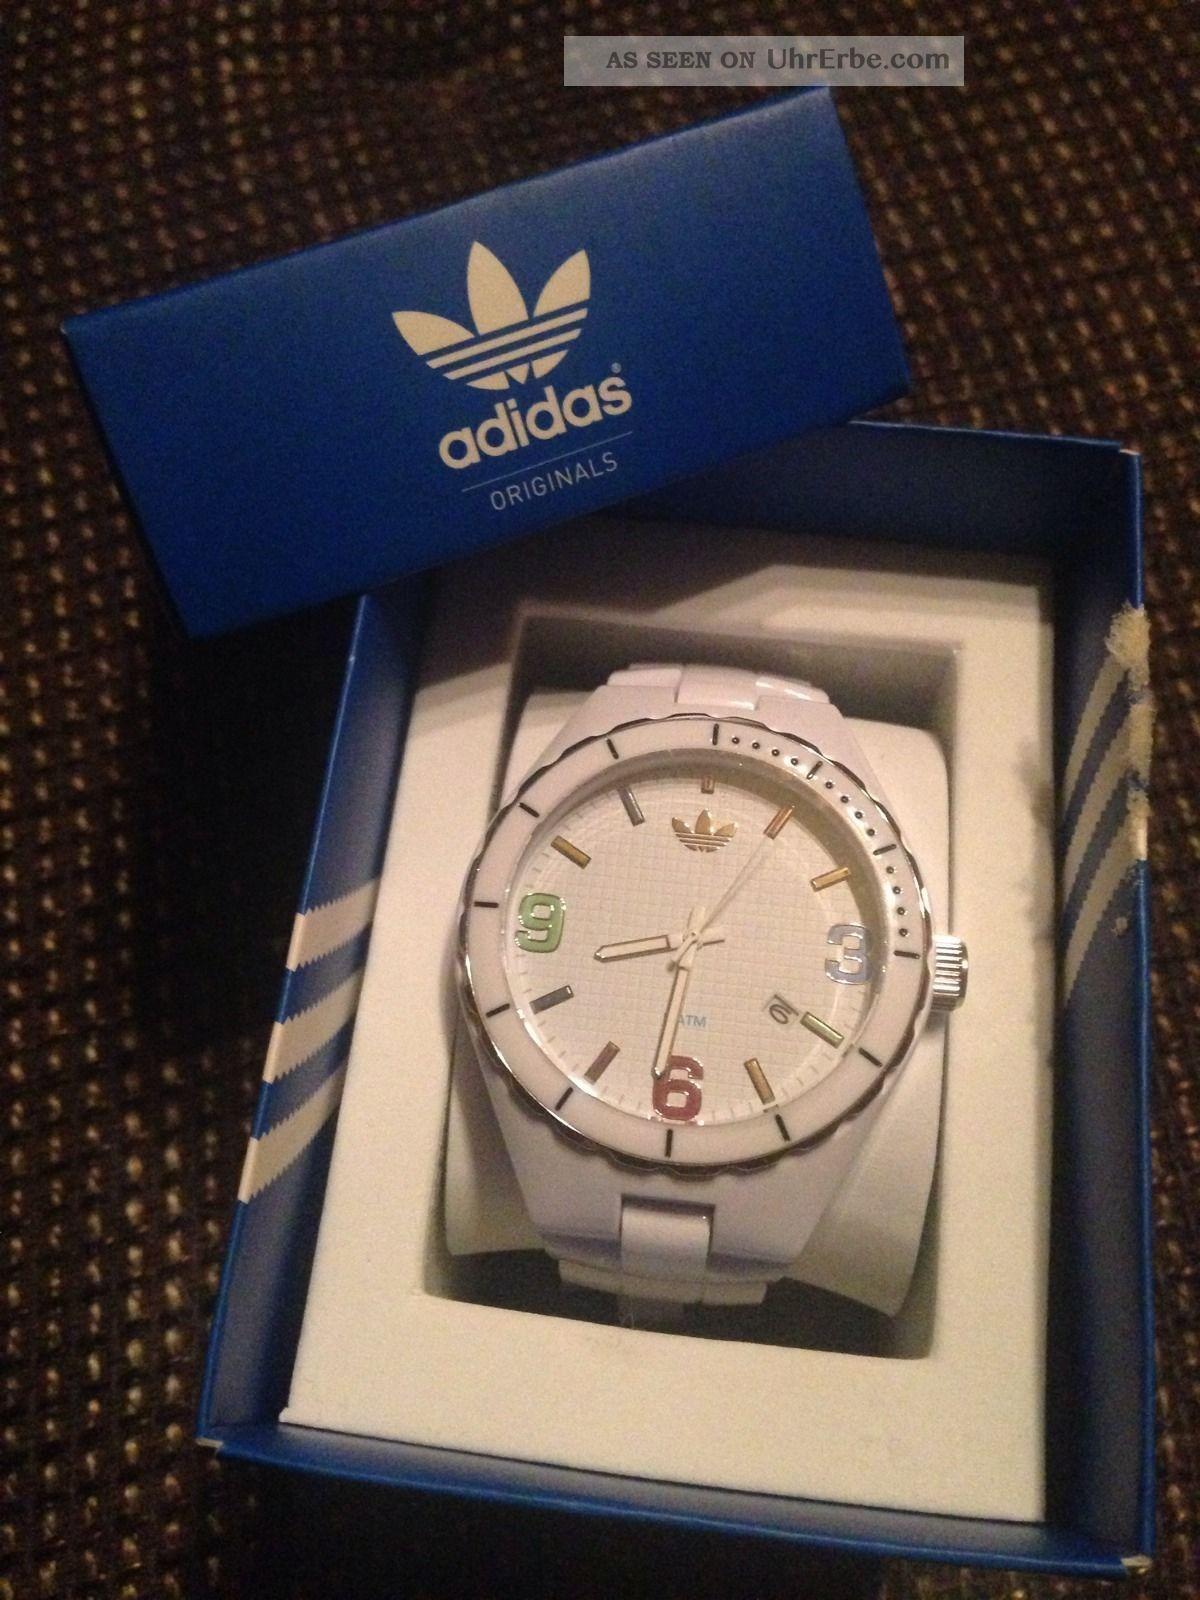 Adidas Damen Uhr Weiss Bunt, Armbanduhren Bild